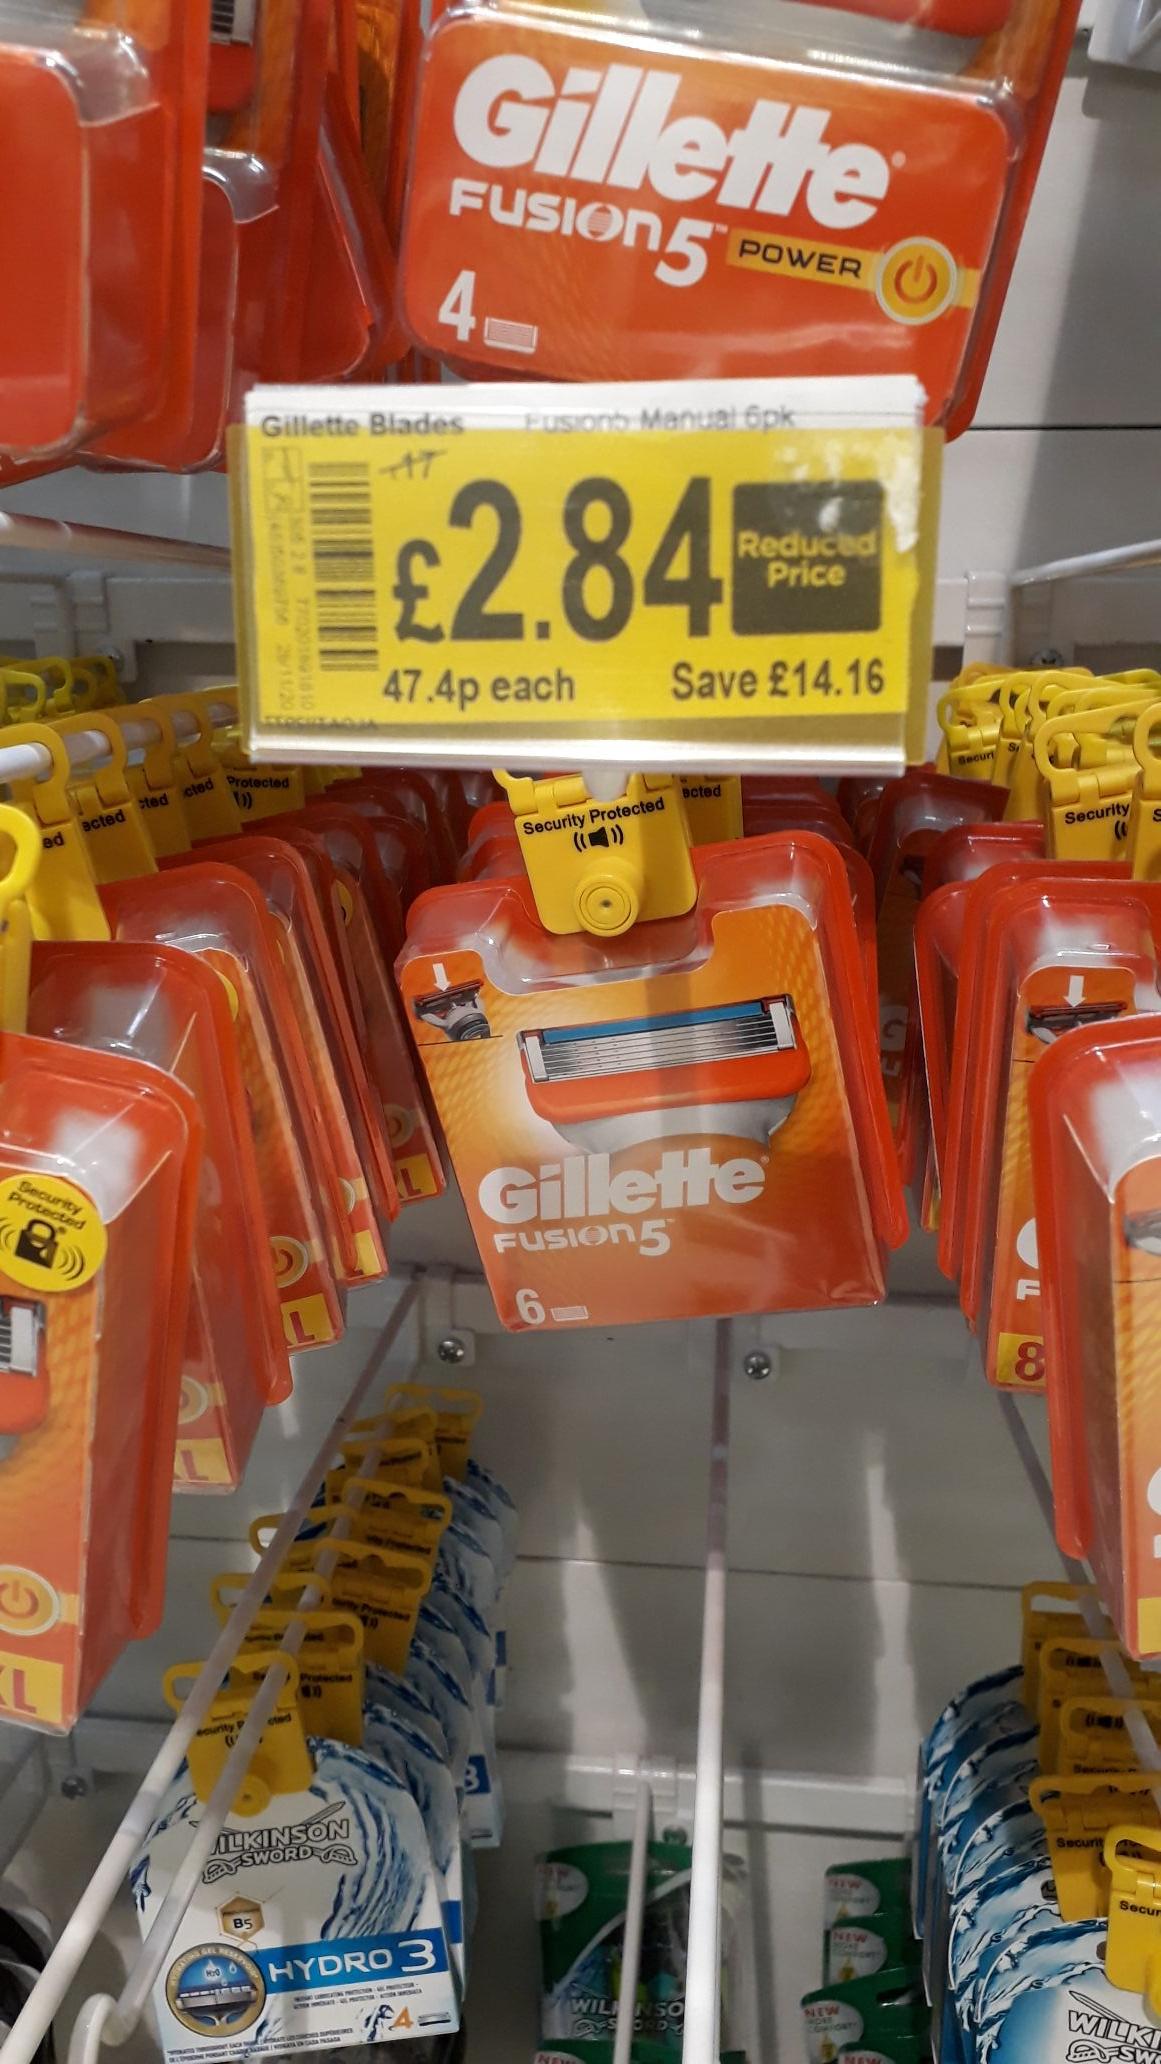 Gillette fusion 6 pack £2.84 at Asda Dewsbury